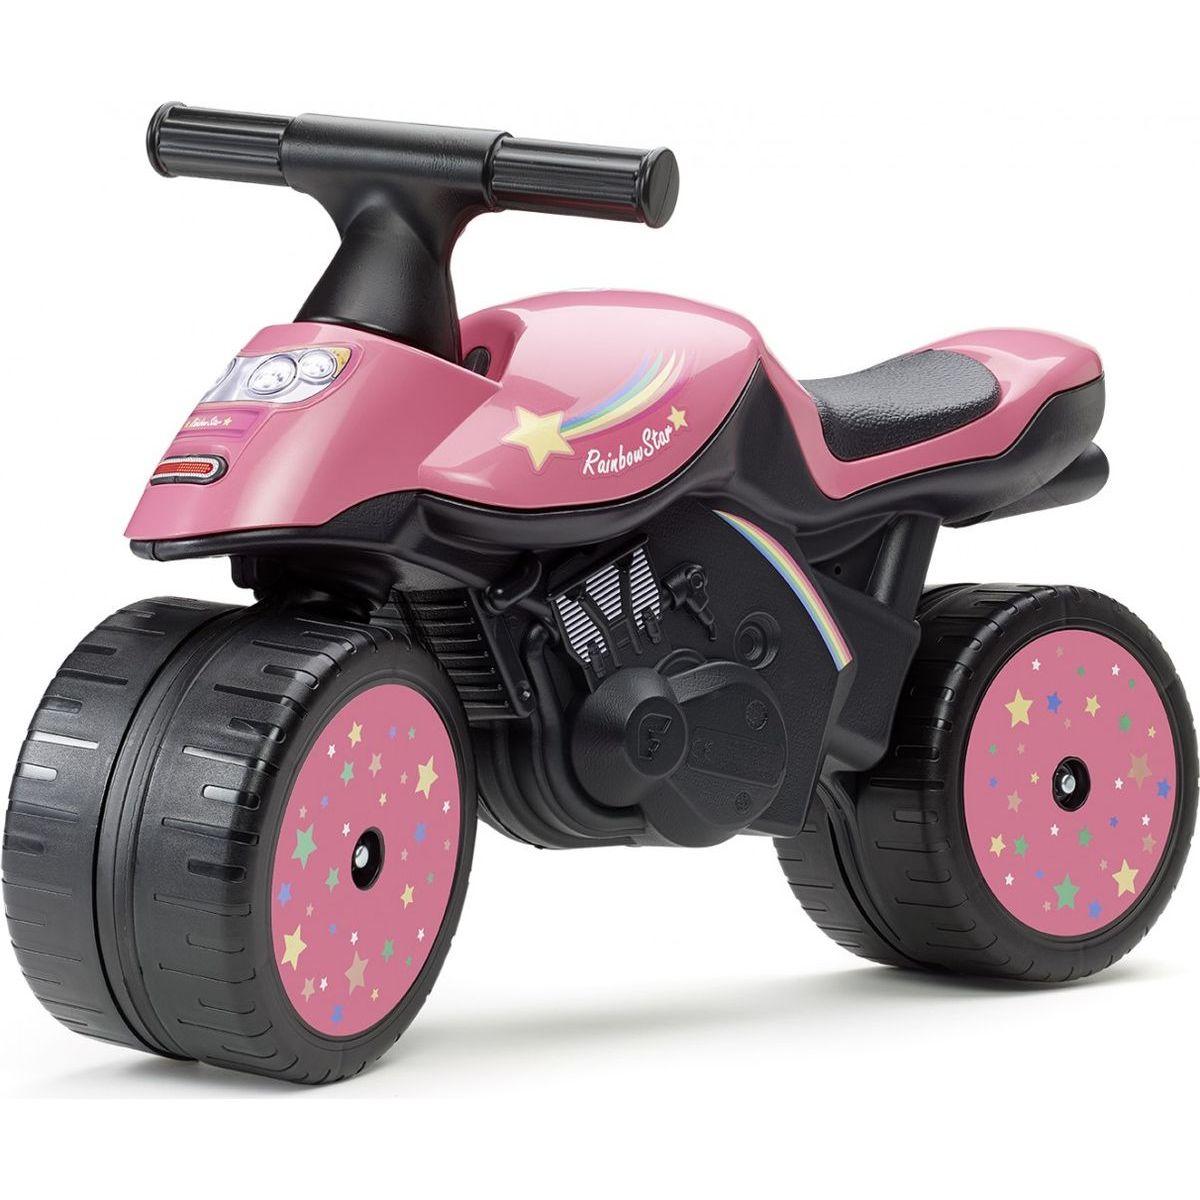 Falk Odstrkovadlo motorka růžová Rainbow star